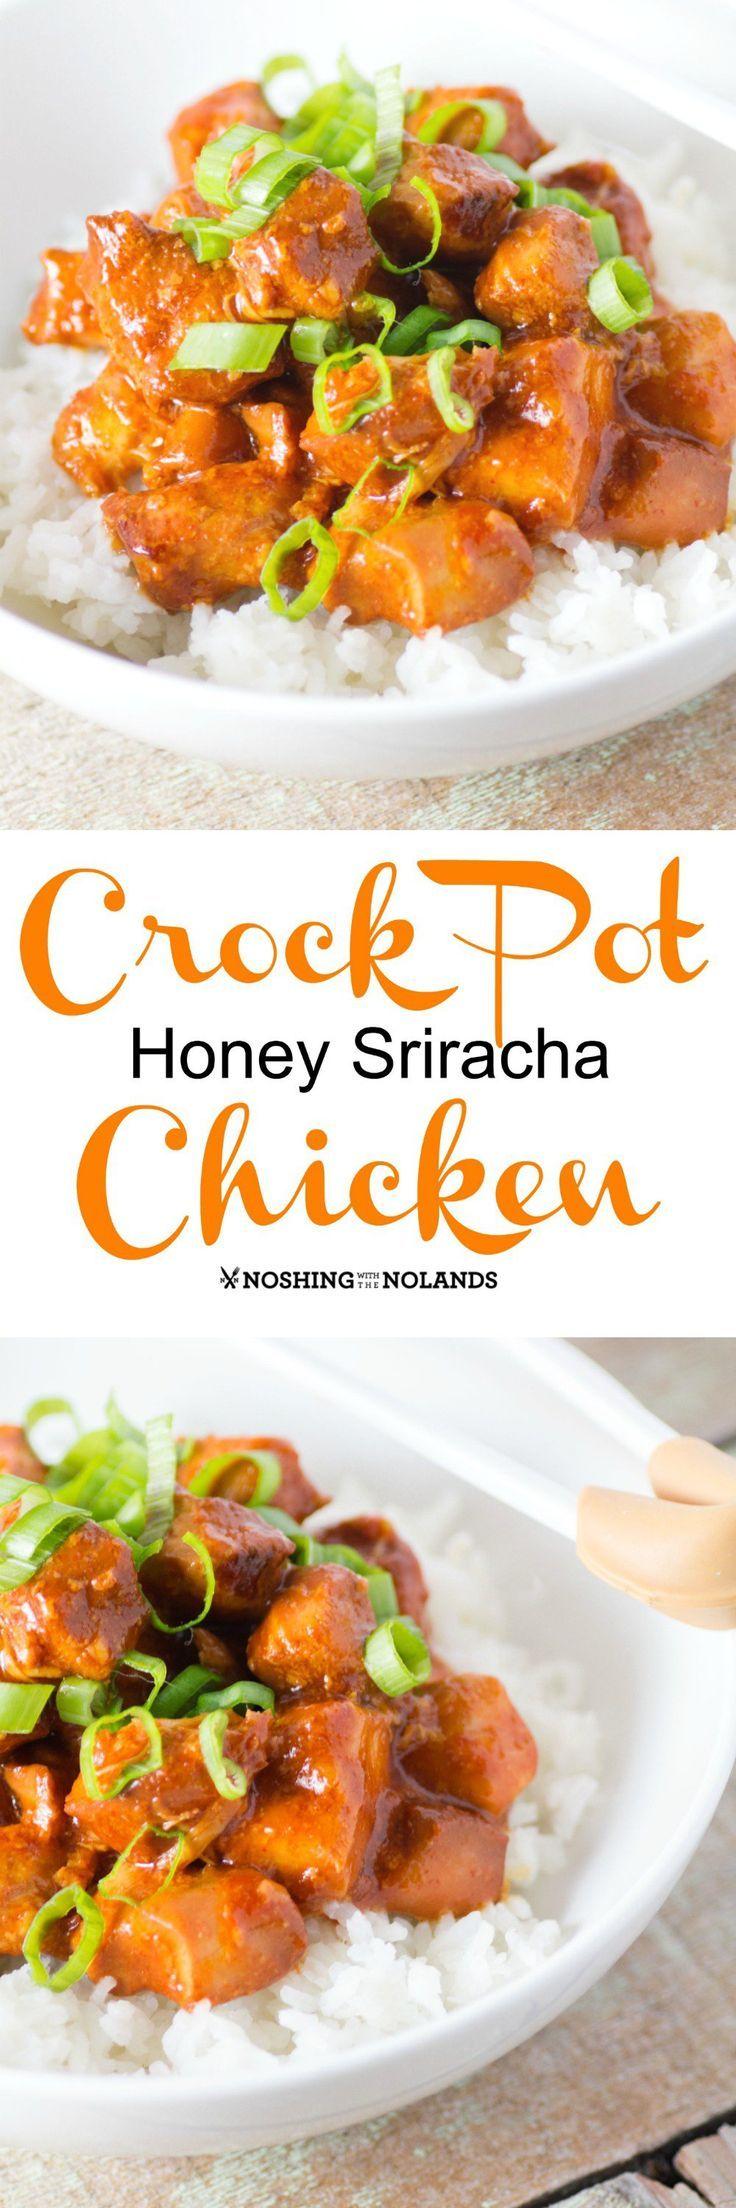 ... Honey Sriracha Chicken on Pinterest | Sriracha Chicken, Chicken and